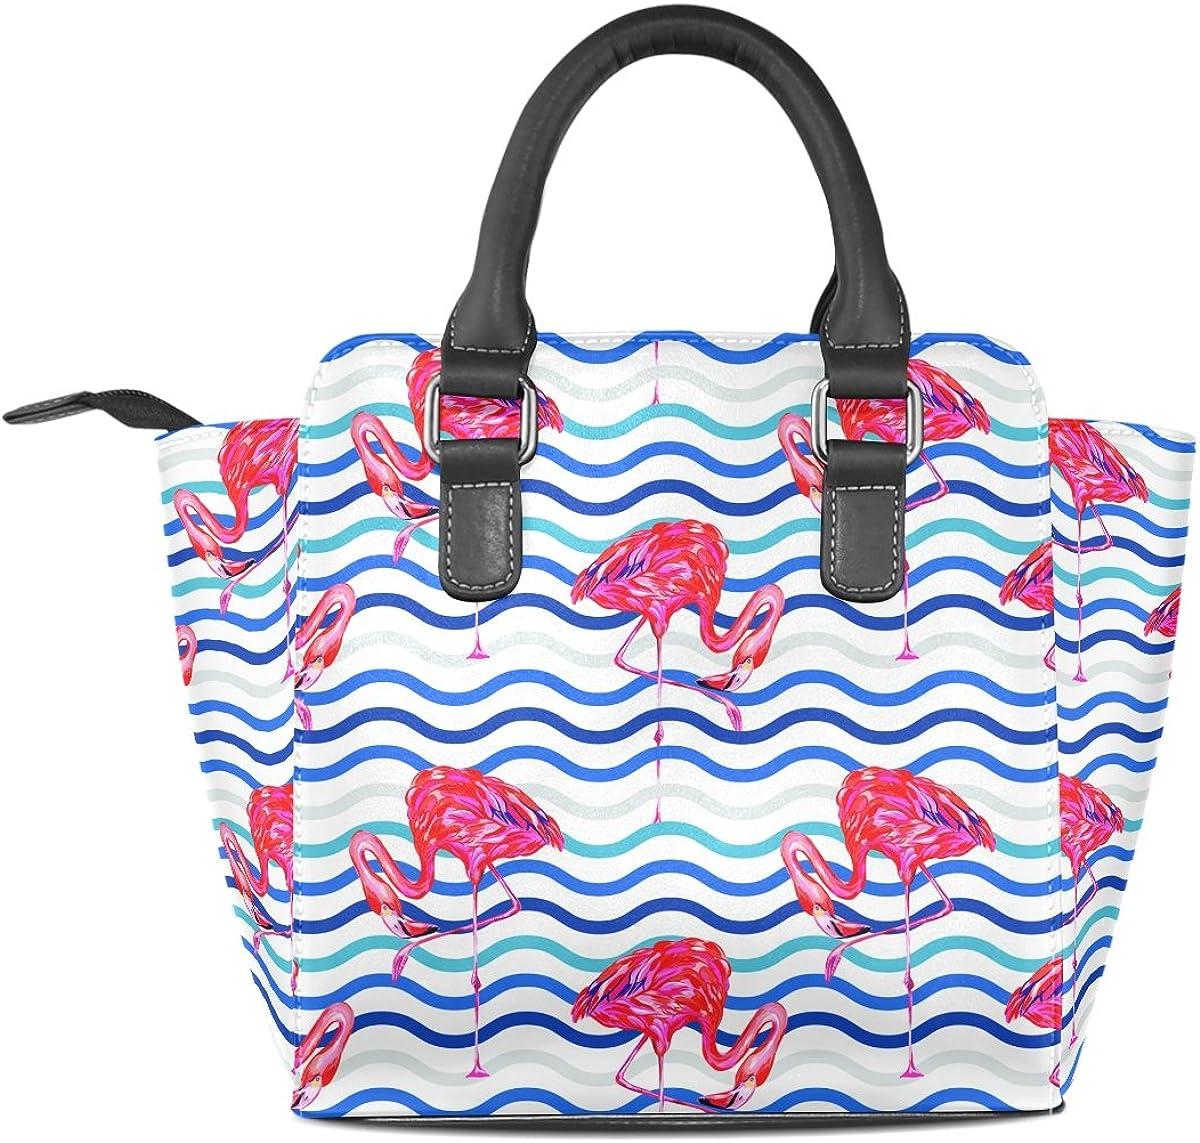 Fresh Flamingos Leather Handbags Purses Shoulder Tote Satchel Bags Womens